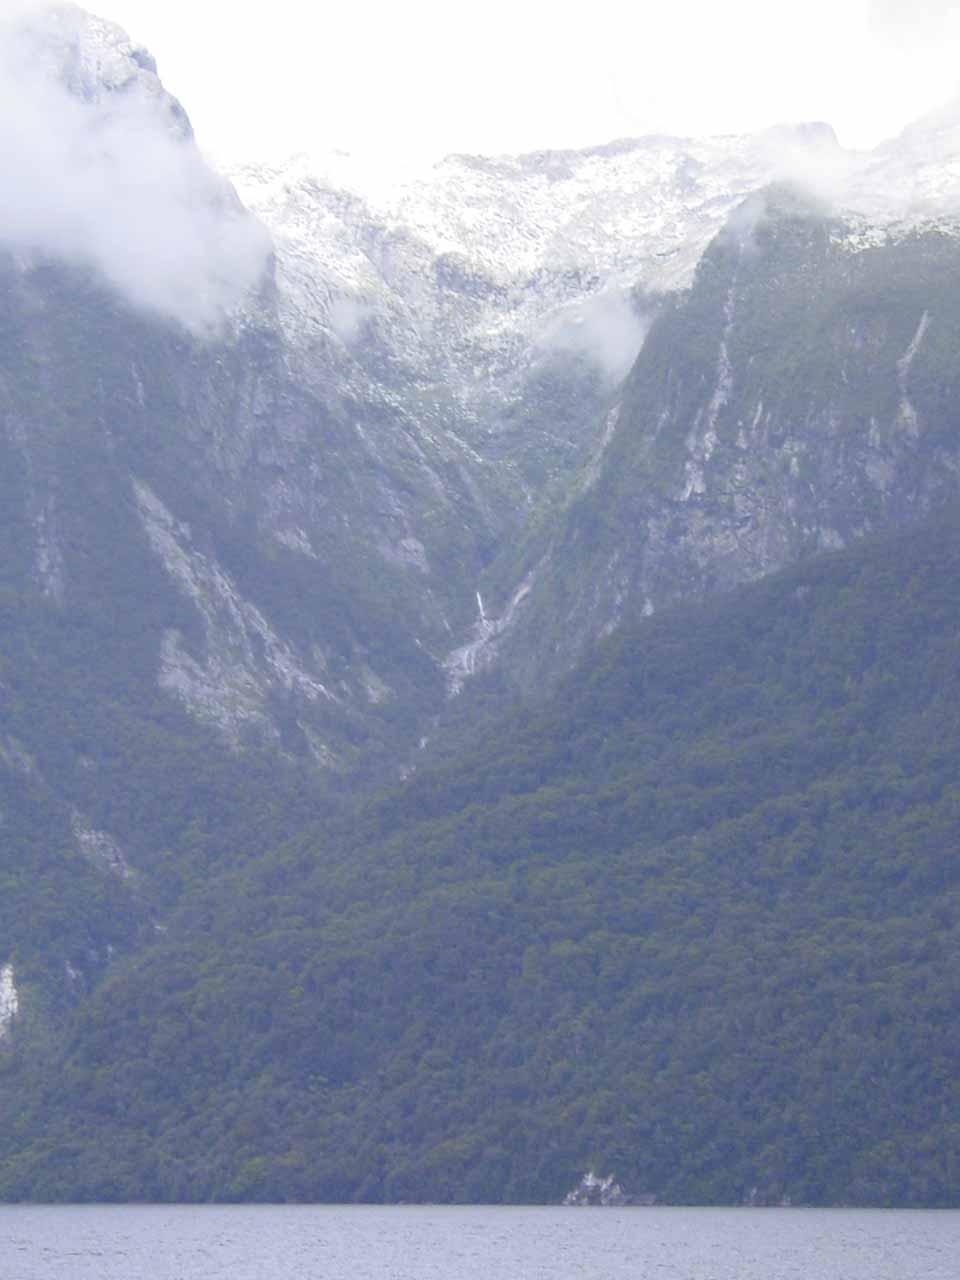 Looking towards an interesting mountain scene